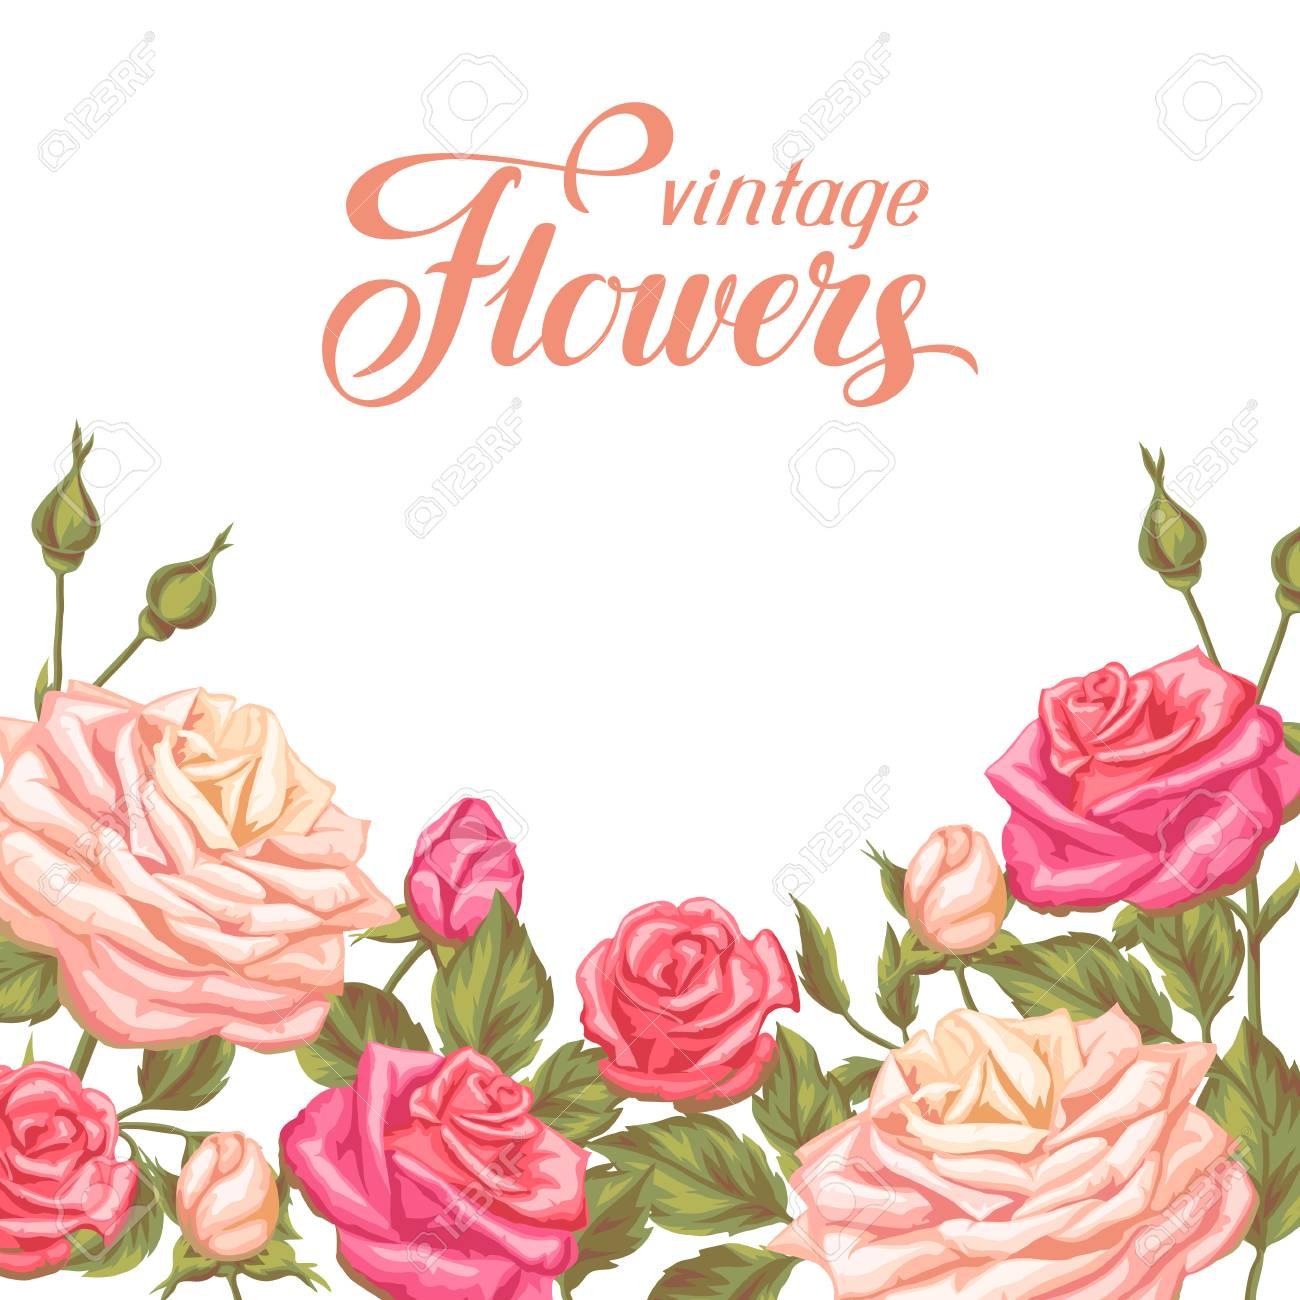 Invitation card with vintage roses decorative retro flowers invitation card with vintage roses decorative retro flowers image for wedding invitations romantic stopboris Images